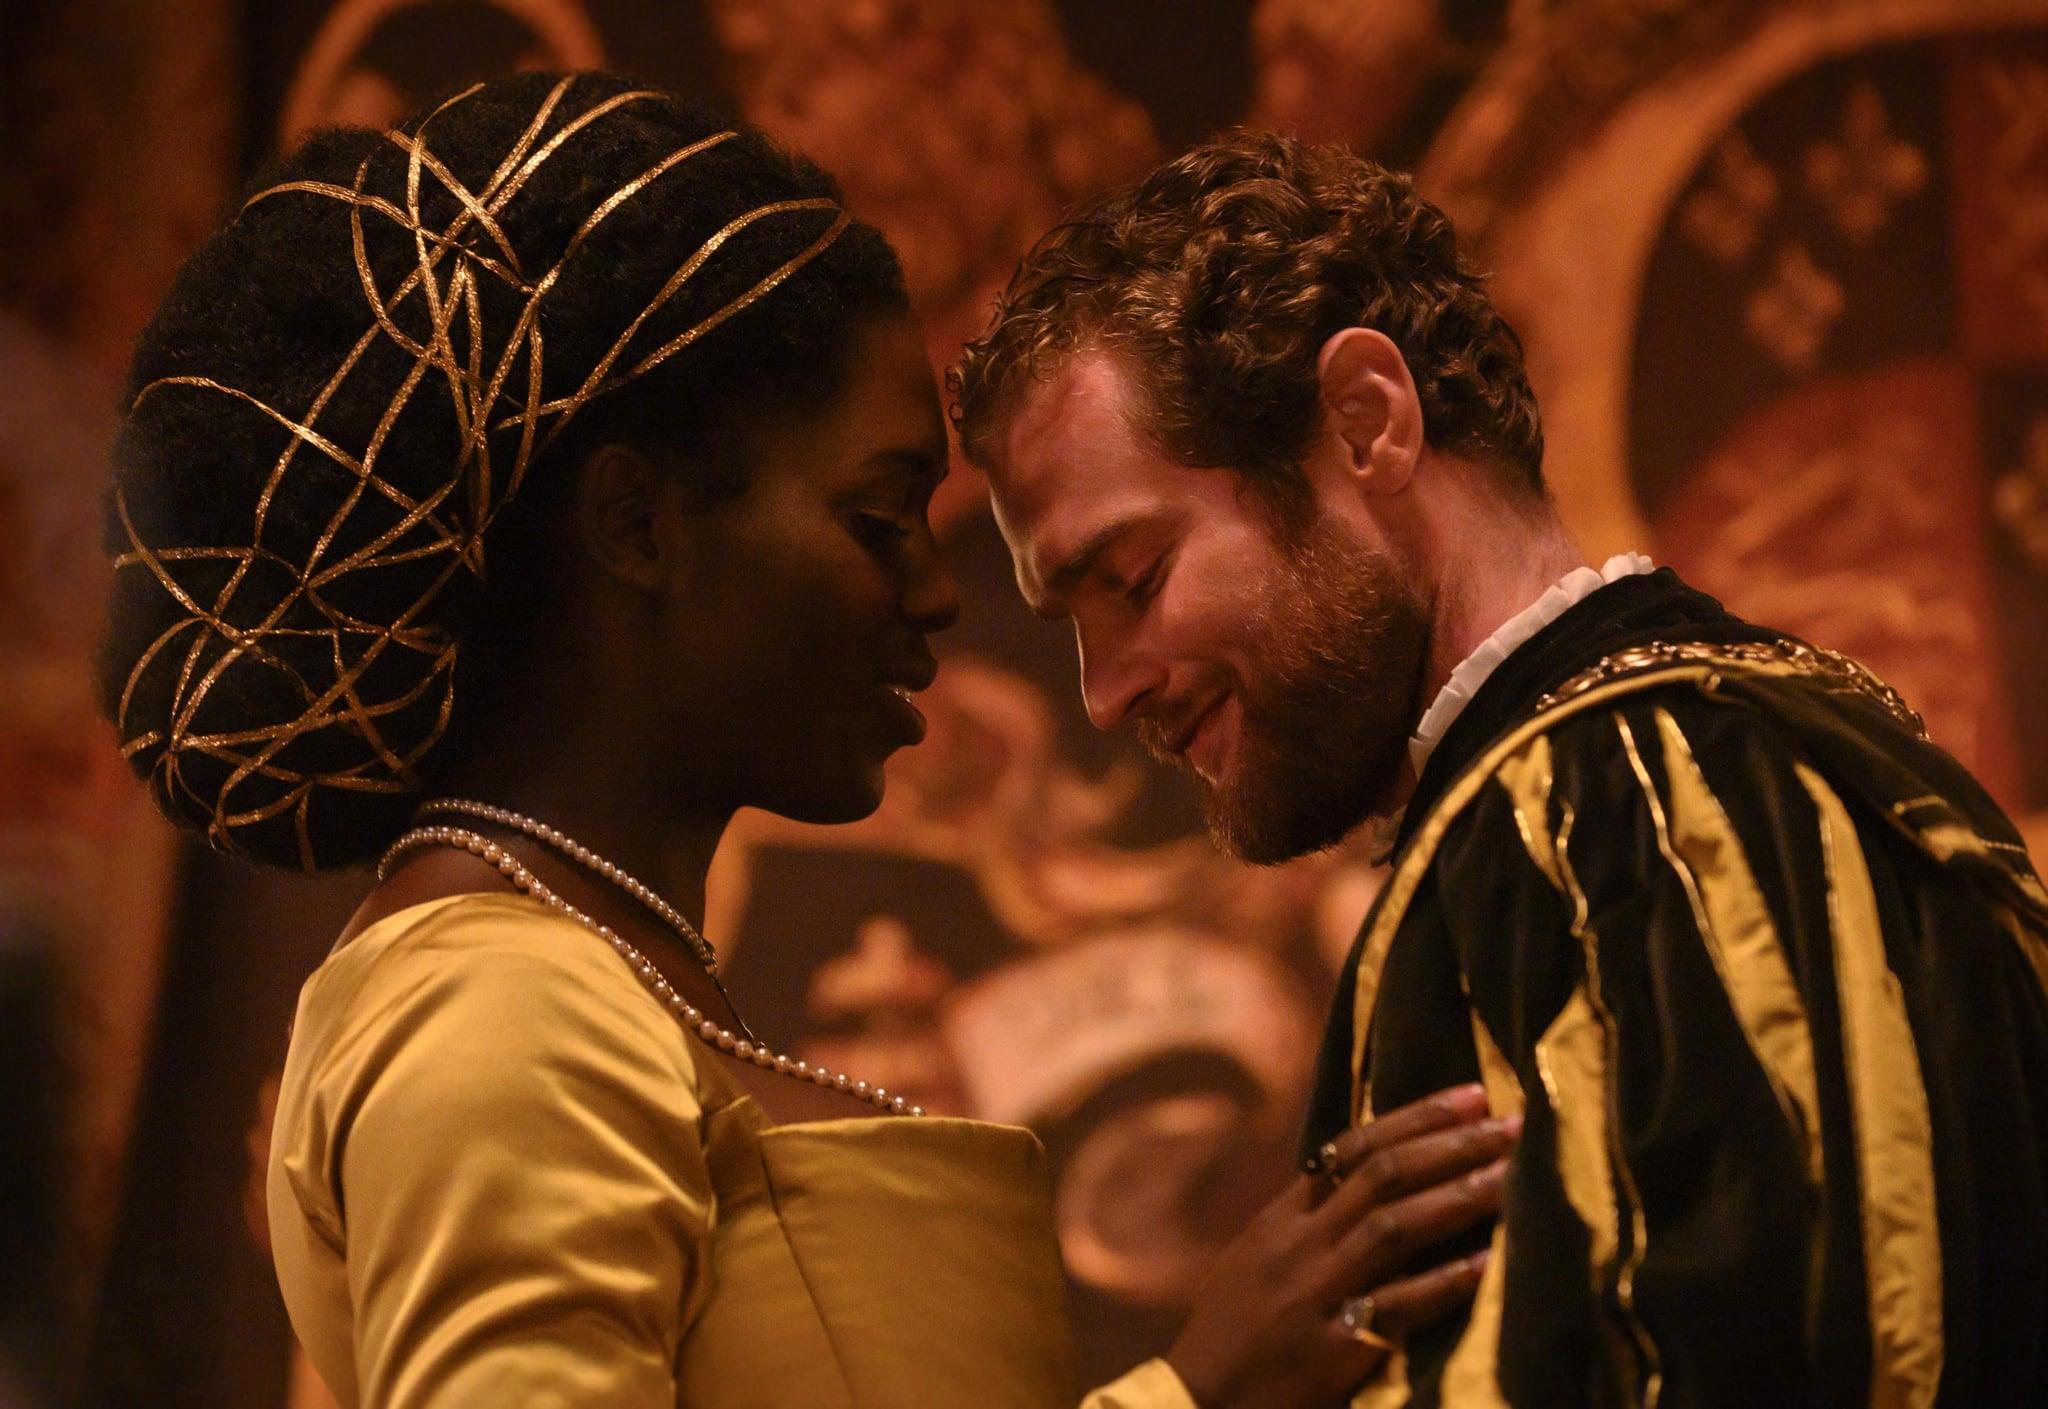 Anne Boleyn: Episode 1 - CAST: Anne Boleyn (Played by Jodie Turner-Smith) and Henry VIII (Played by Mark Stanley)